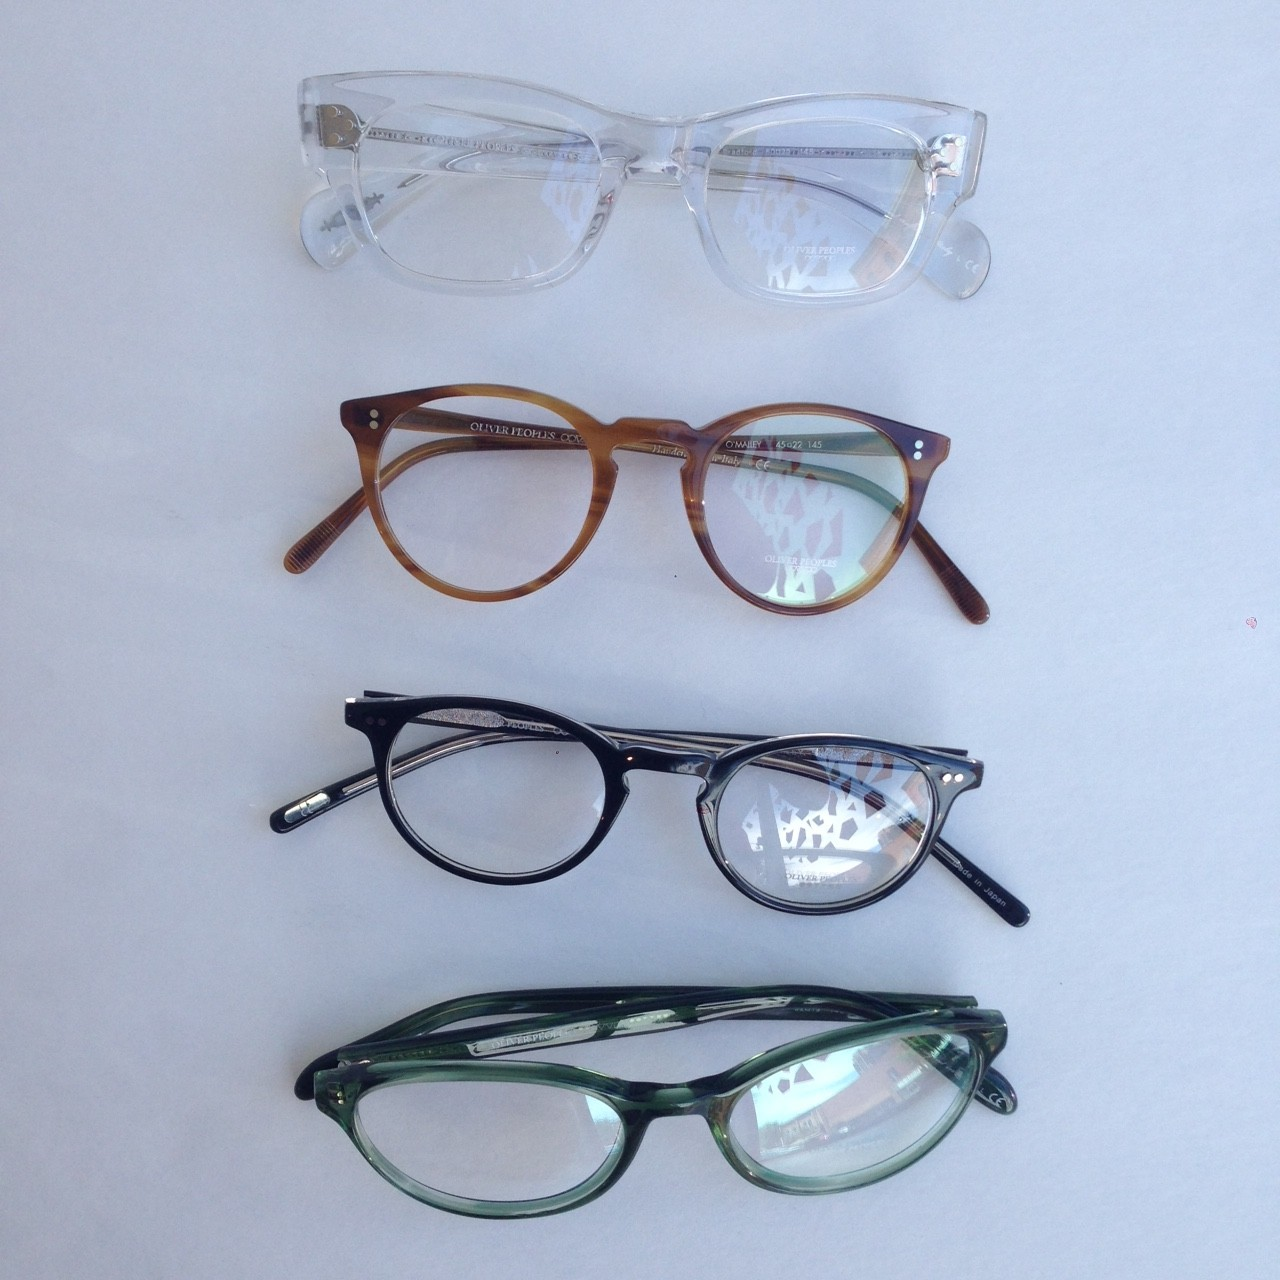 Iconic Eyewear: Casino and American Psycho - Opticianado